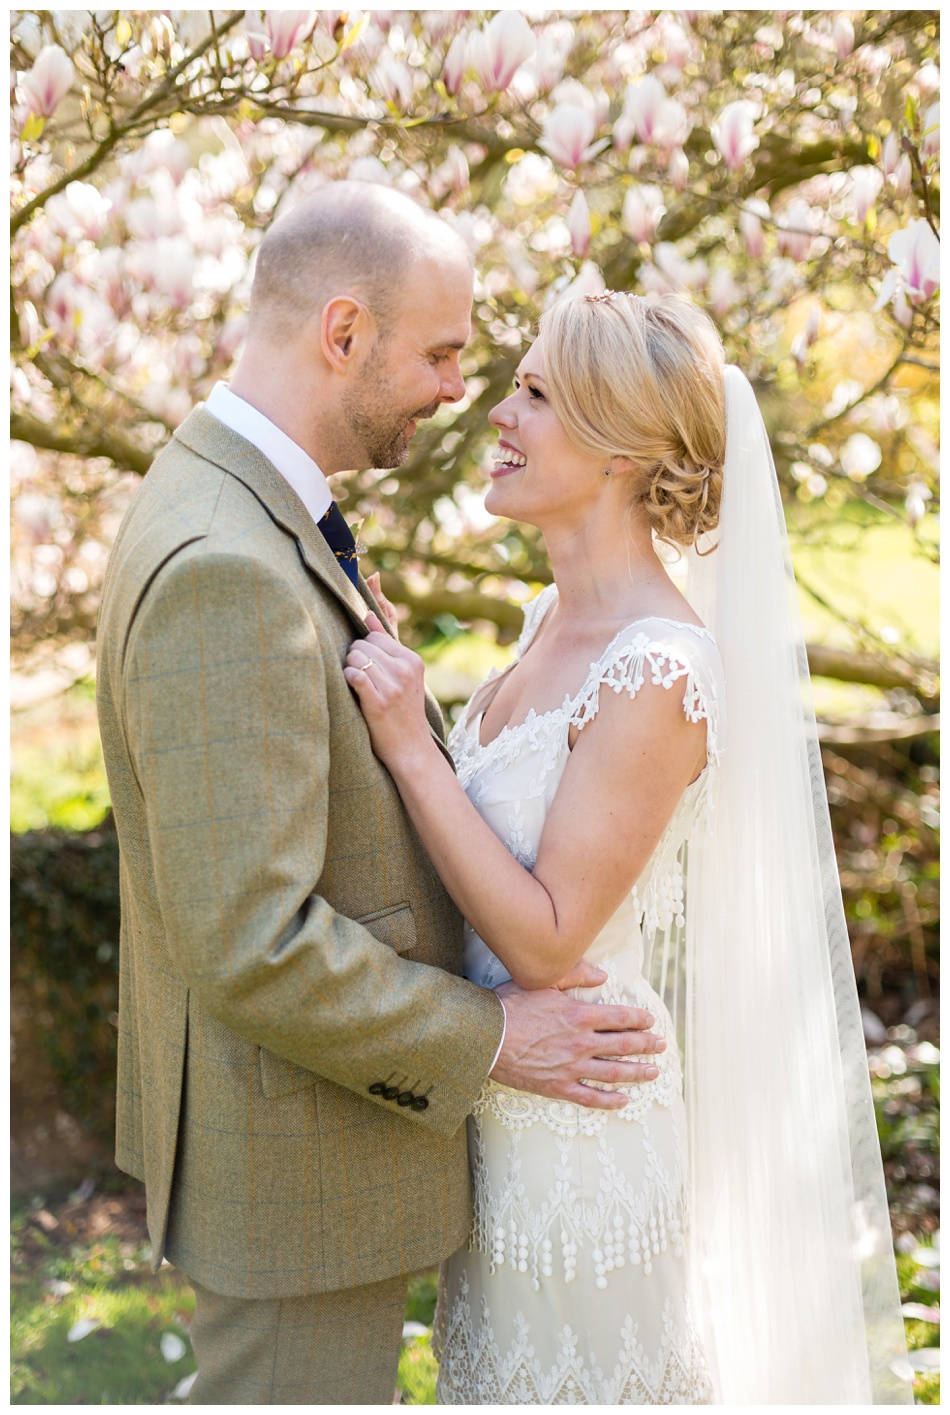 Spring wedding at Ettington Park